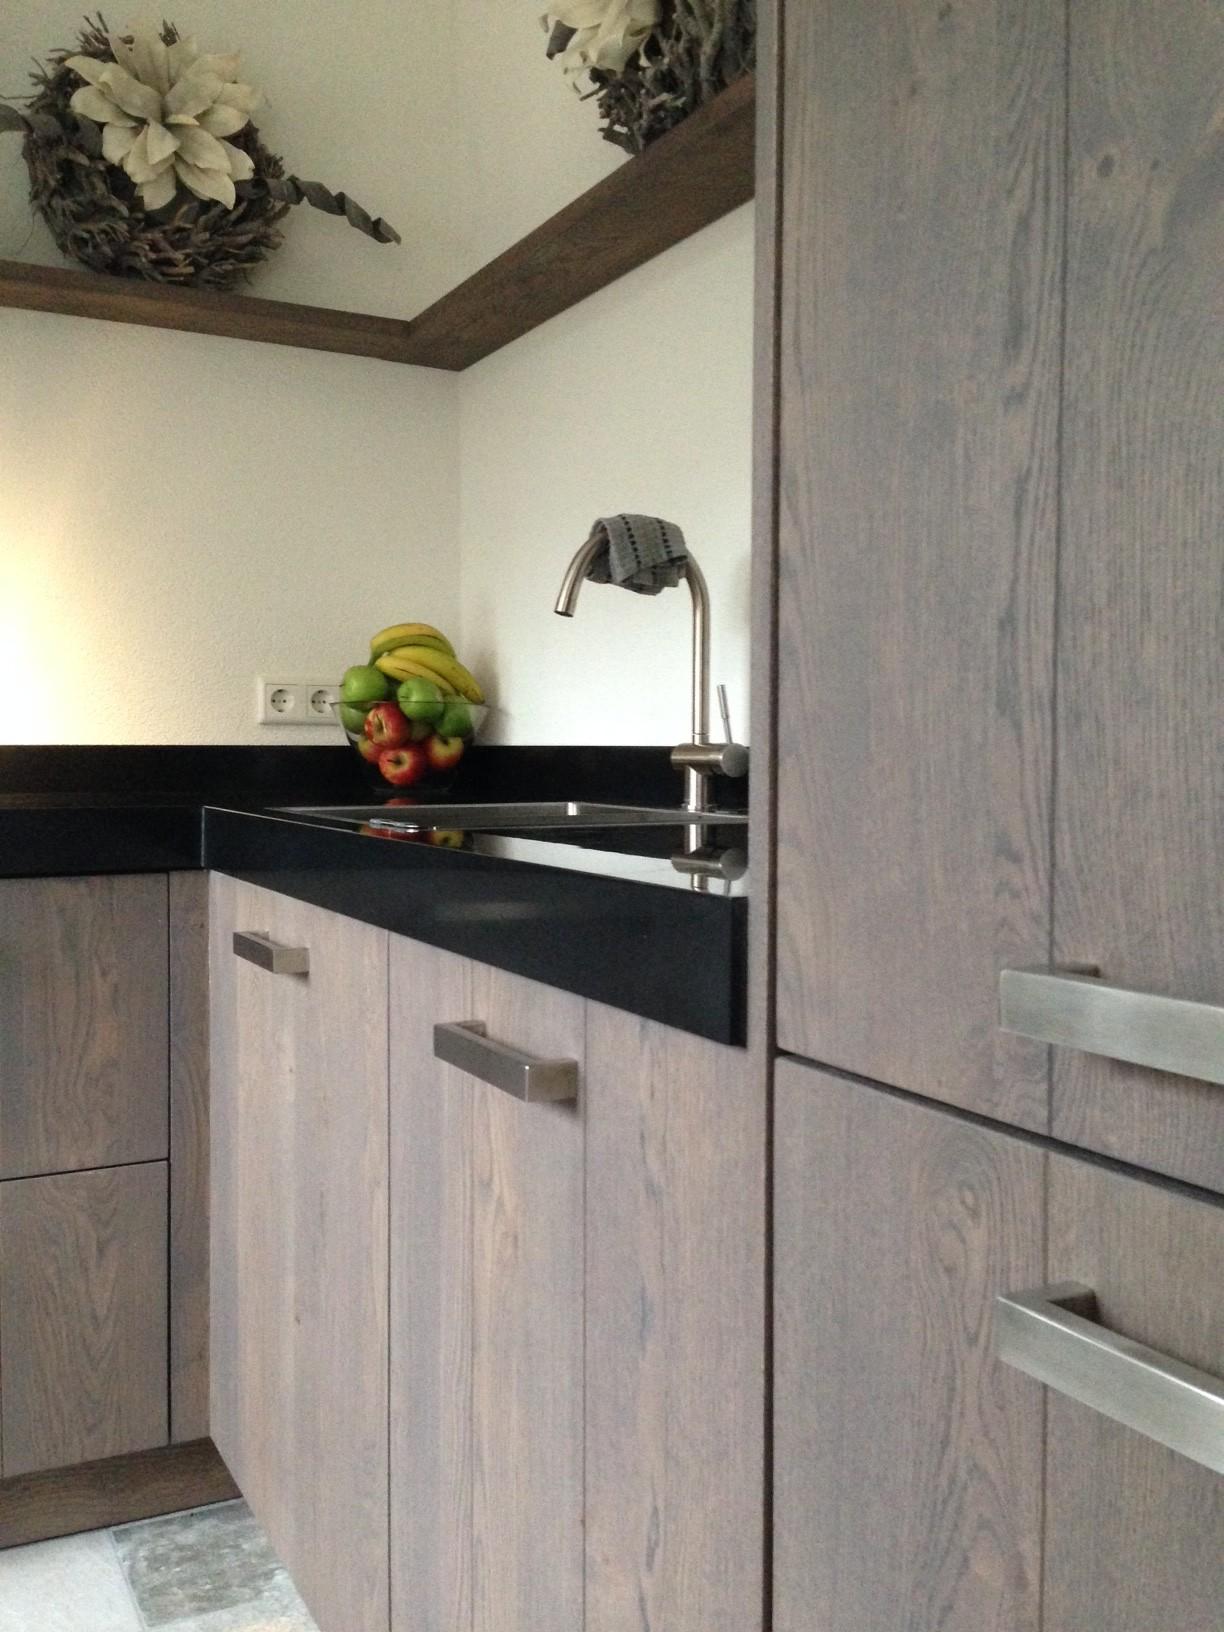 Eiken Keukens Logen : Eikenhouten Keuken Greywash Pictures to pin on Pinterest